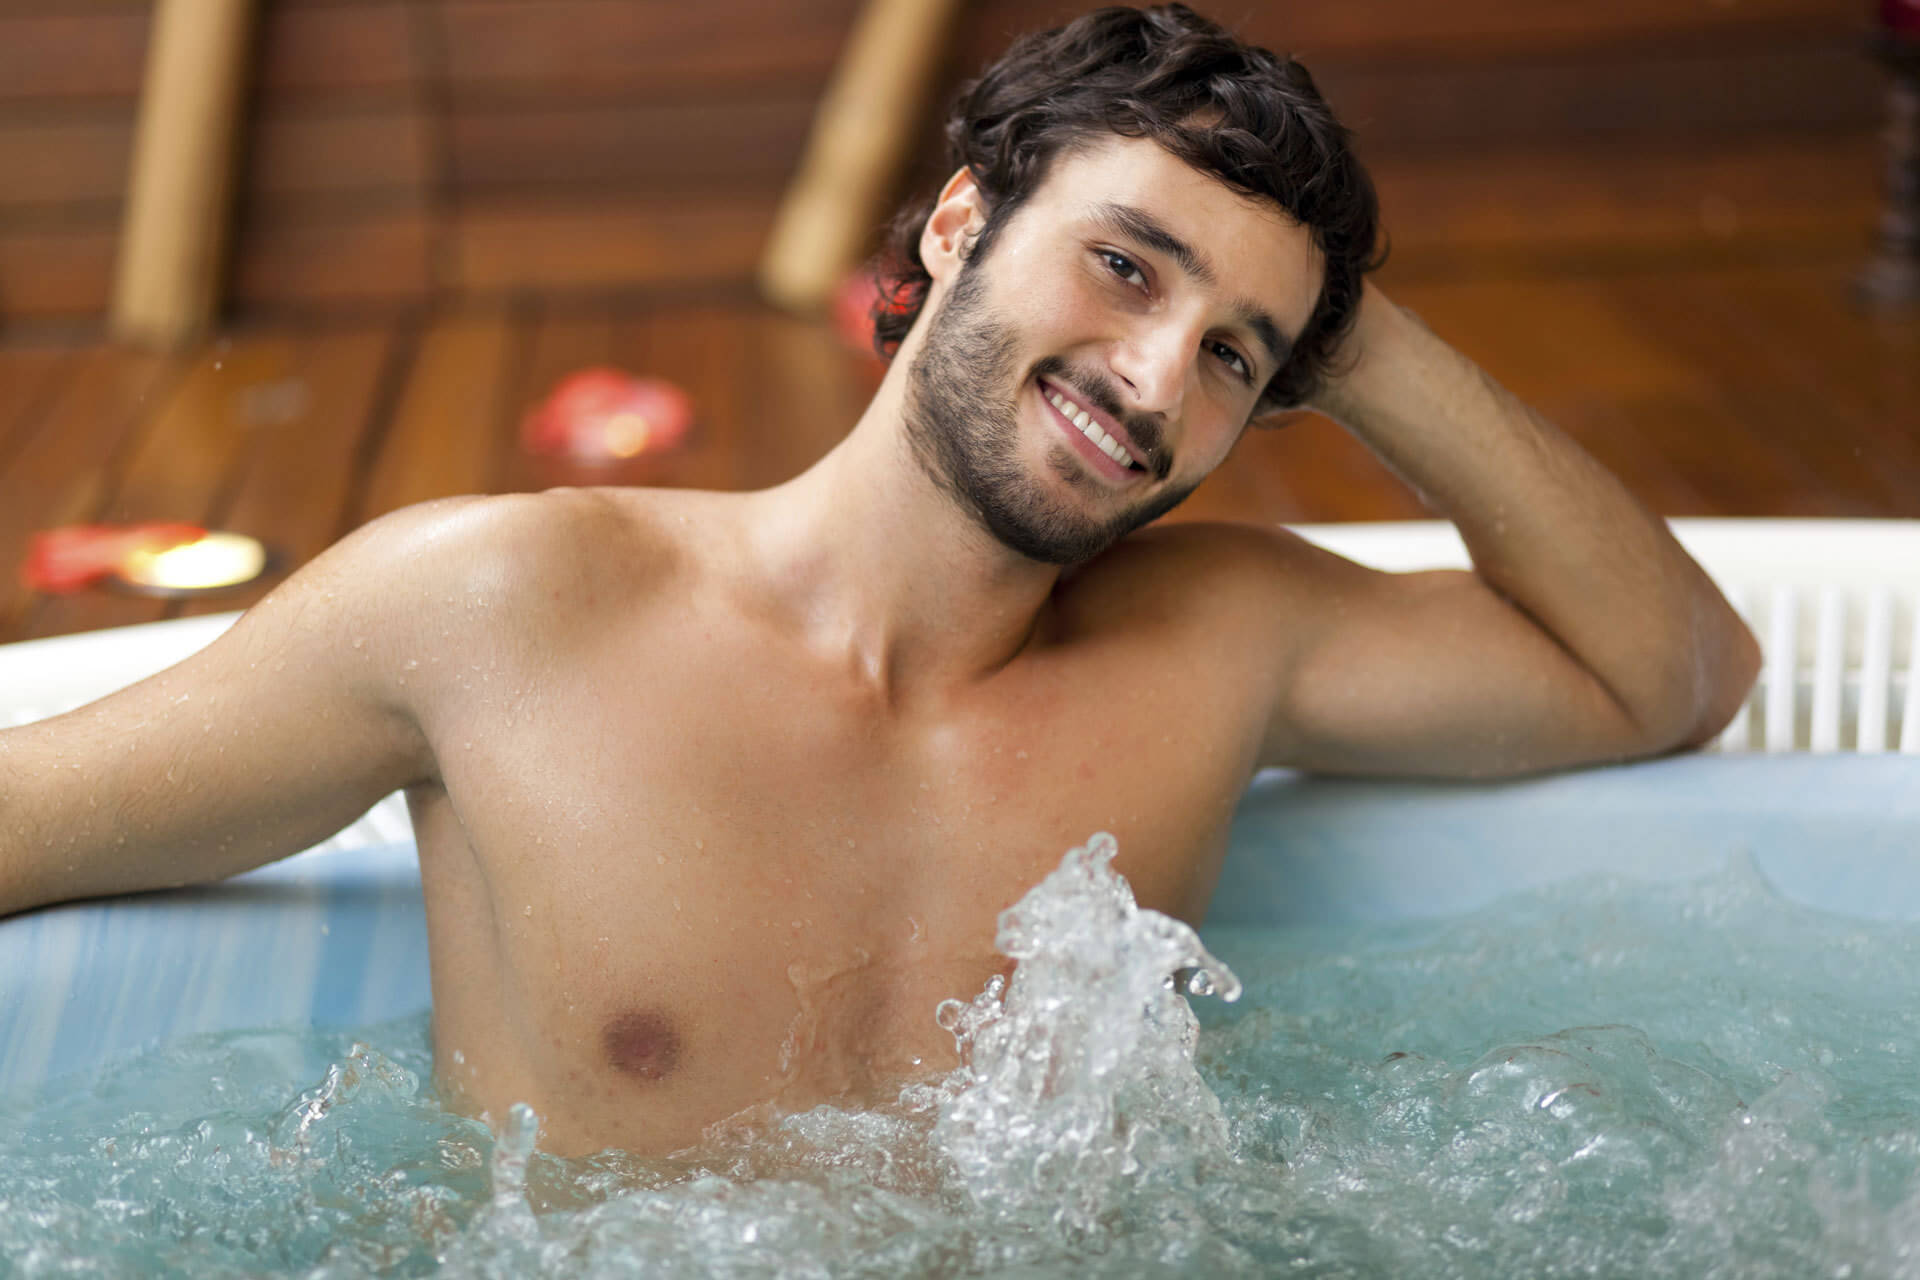 Sexy gay porn stars naked